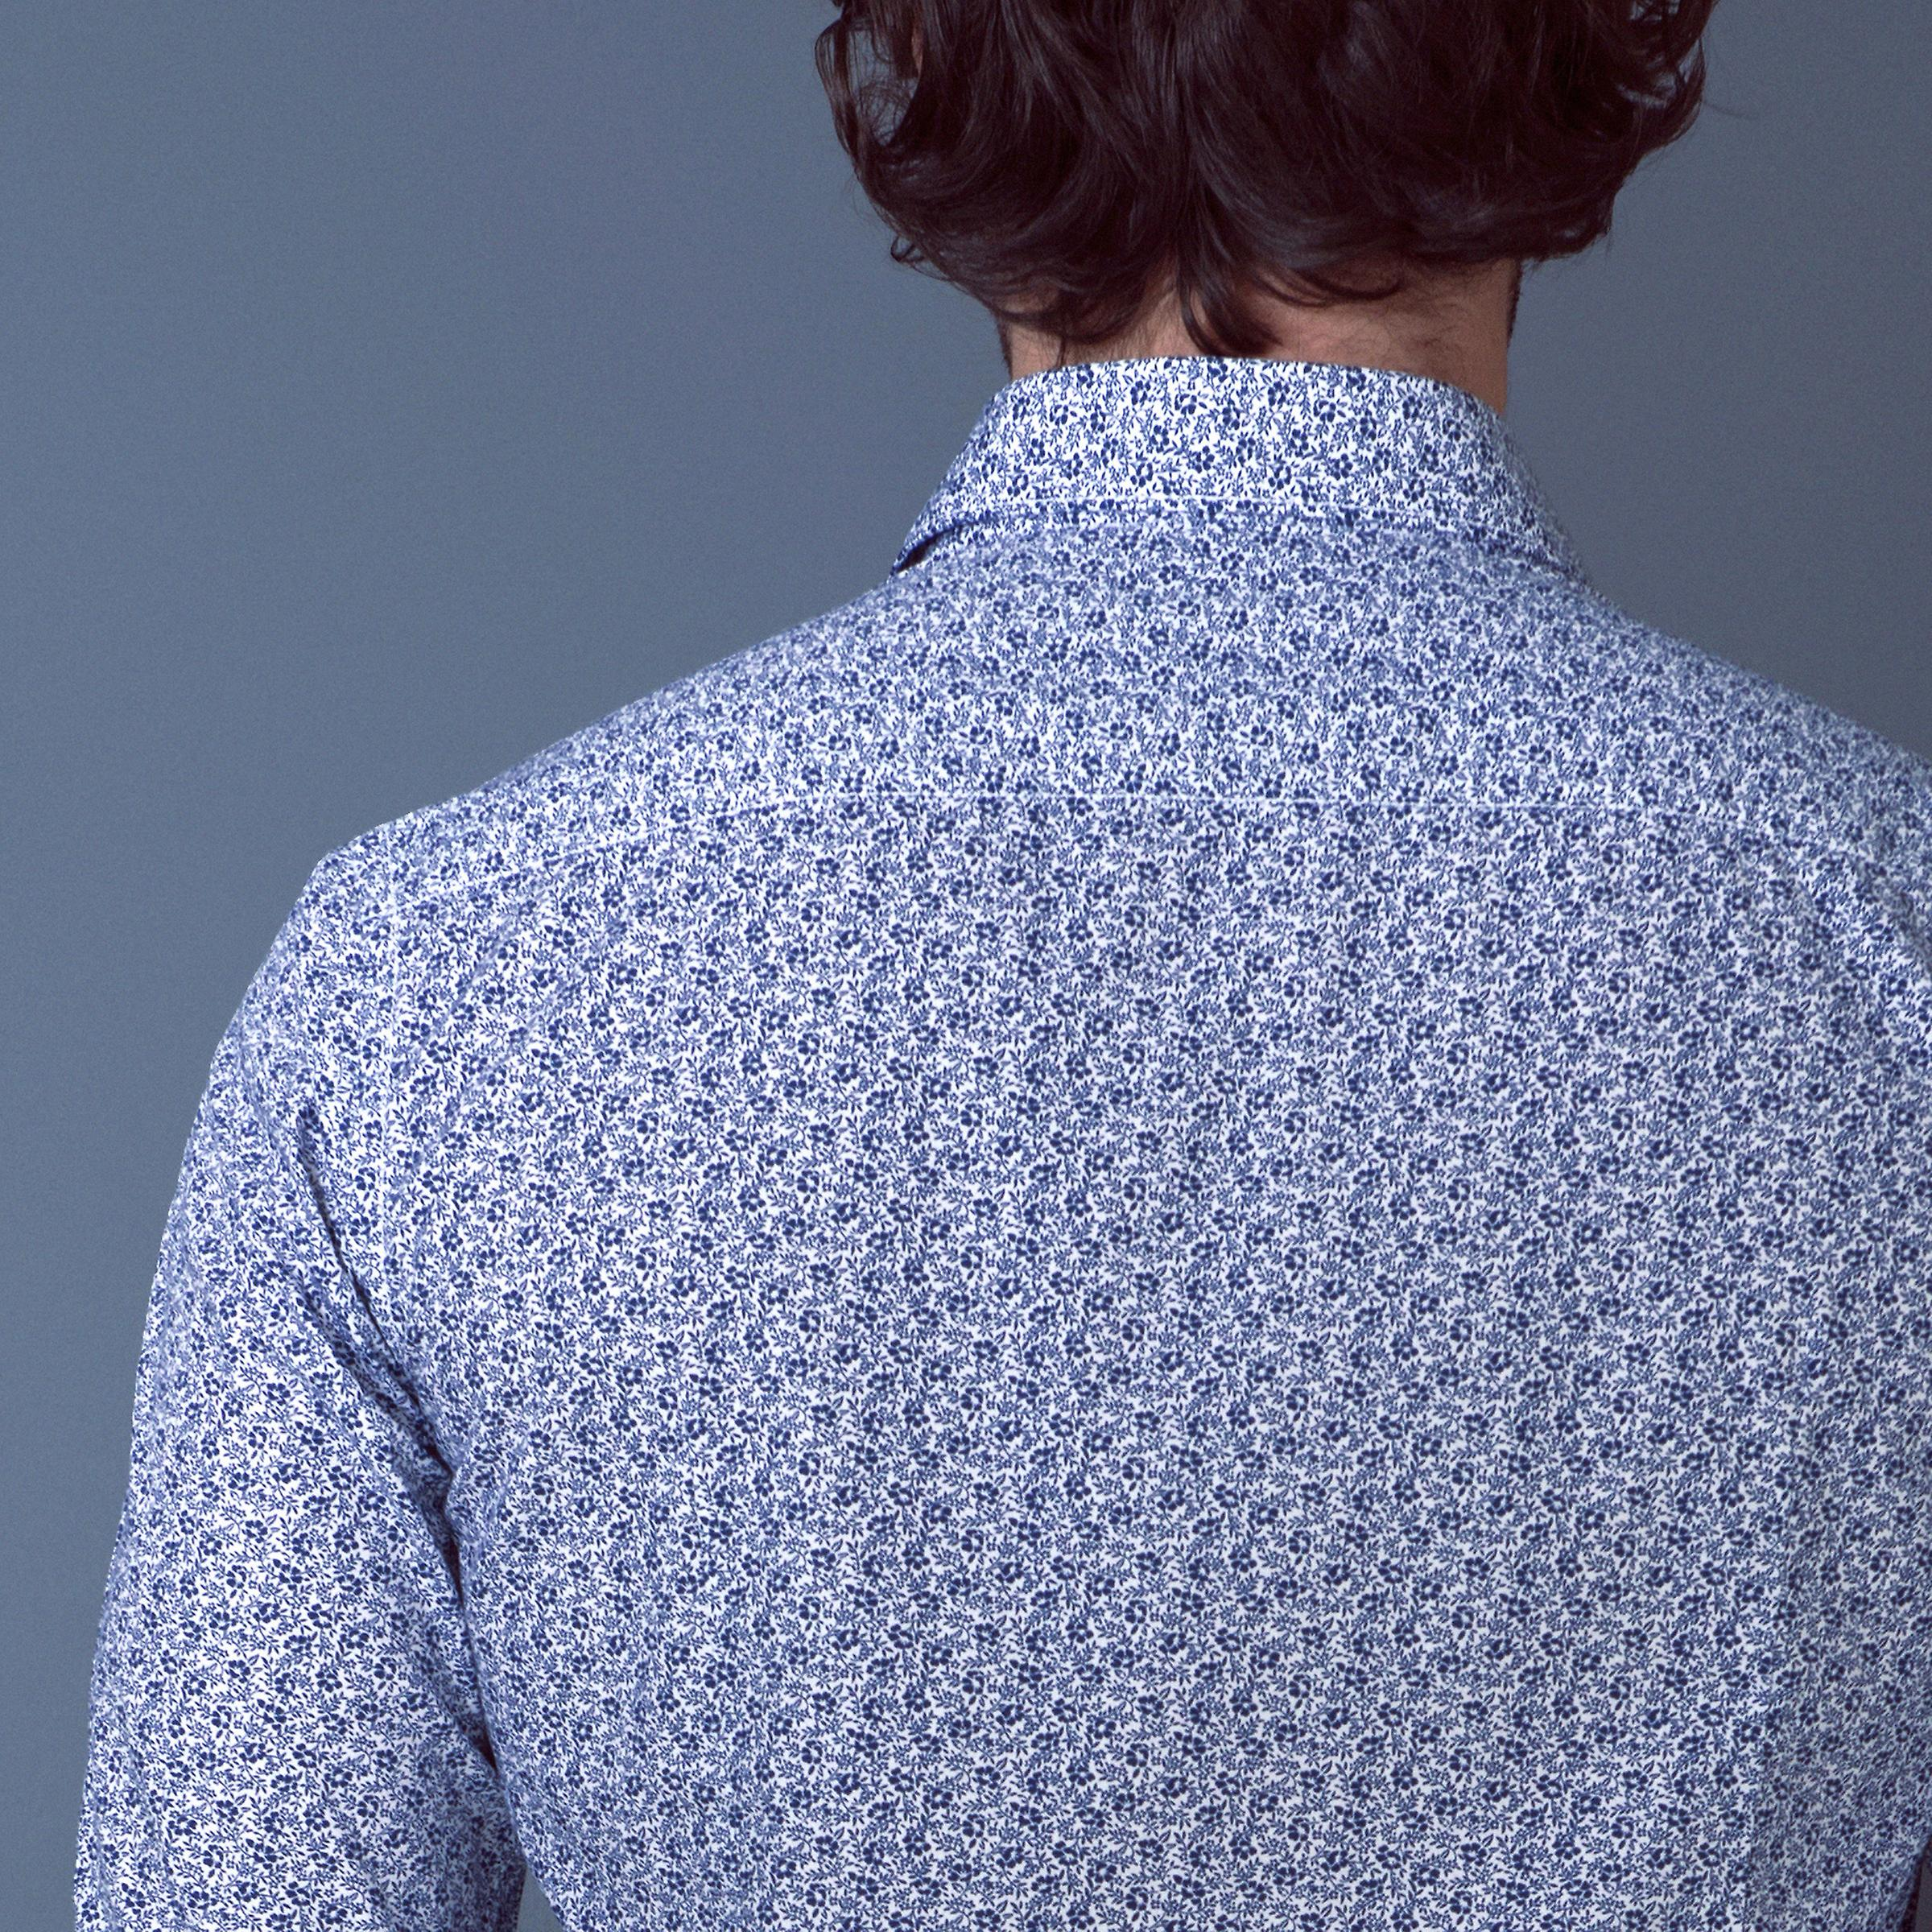 Fabio Giovanni Biccari Shirt - Mens Italian Floral Casual Shirt - Long Sleeve